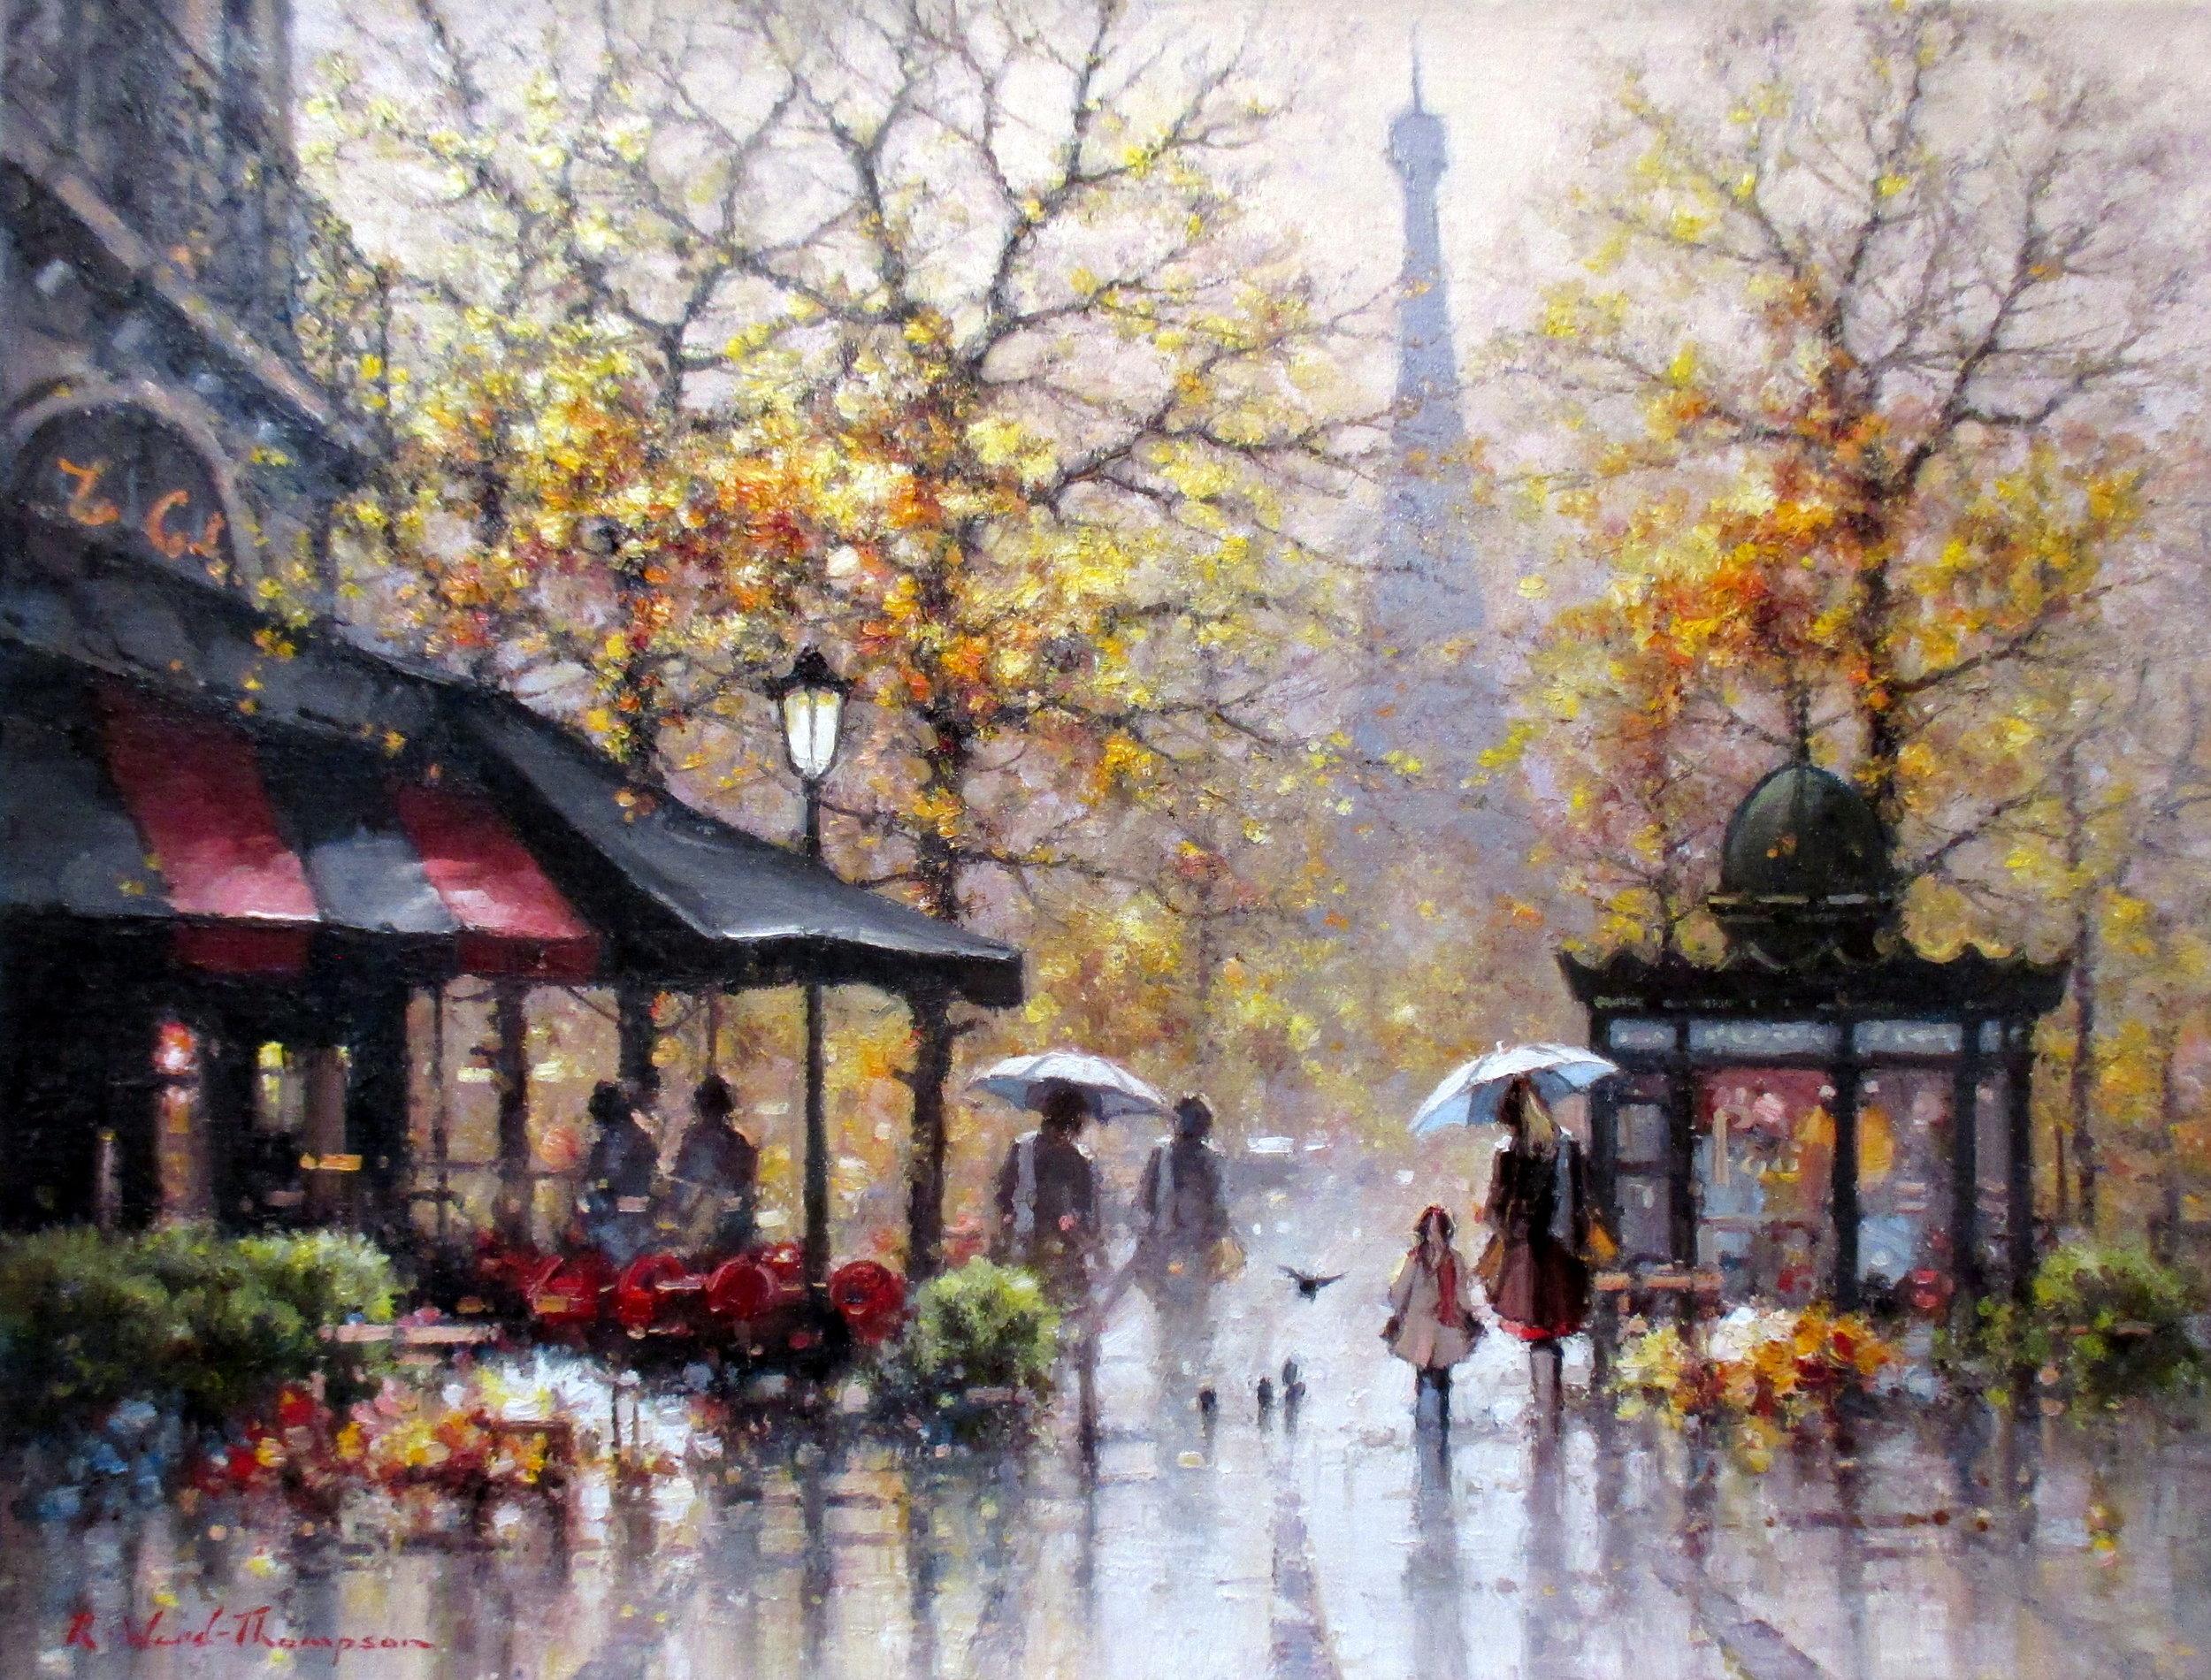 Autumn Showers in the Place de Varsovie, Paris